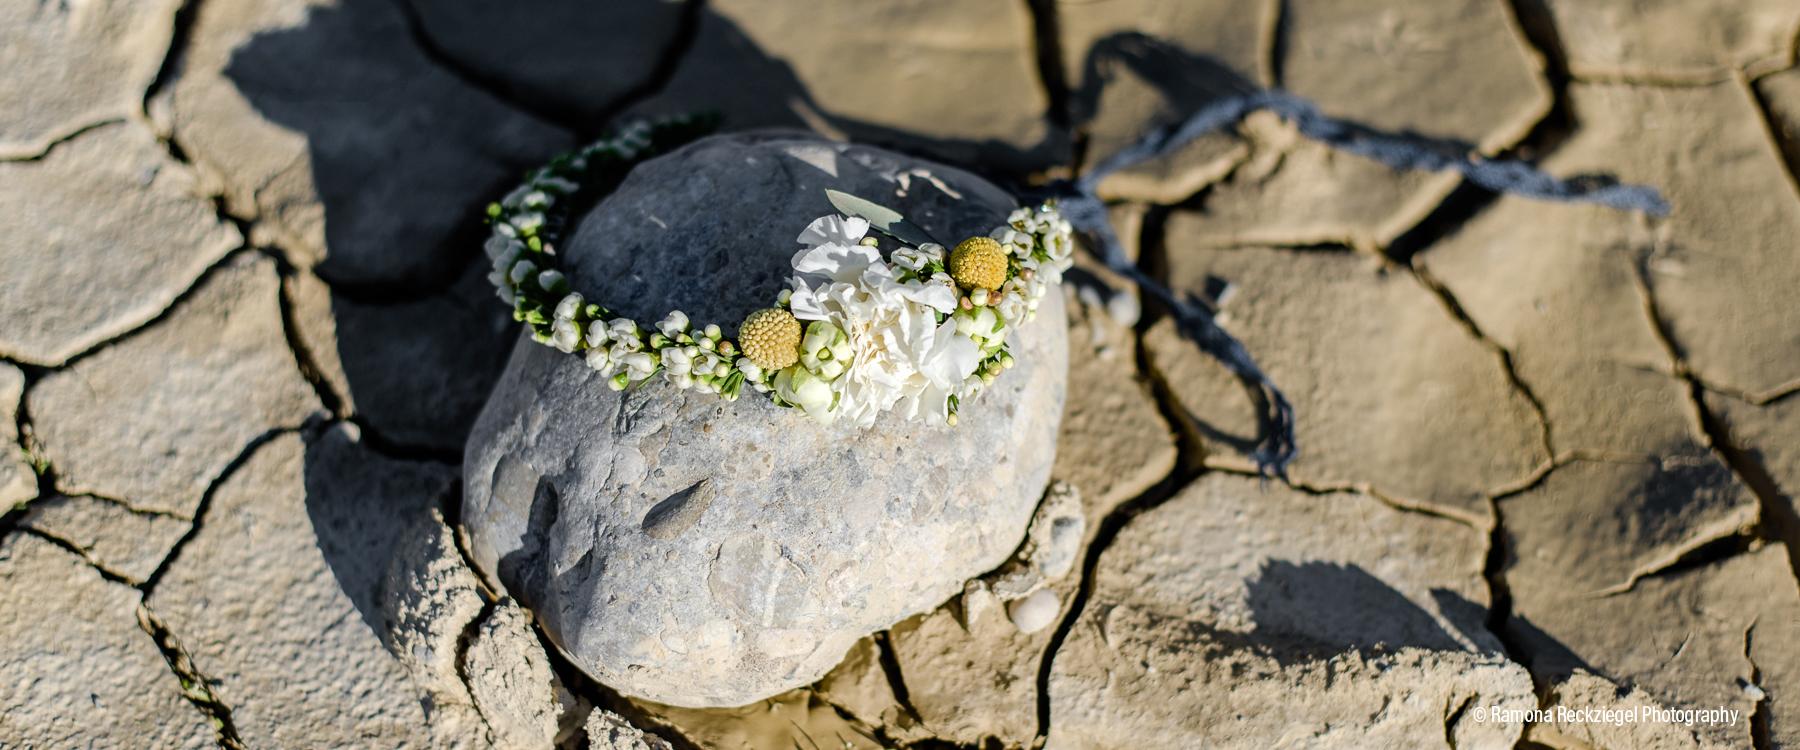 wedding-fotos-cinema-rrp-1539.jpg